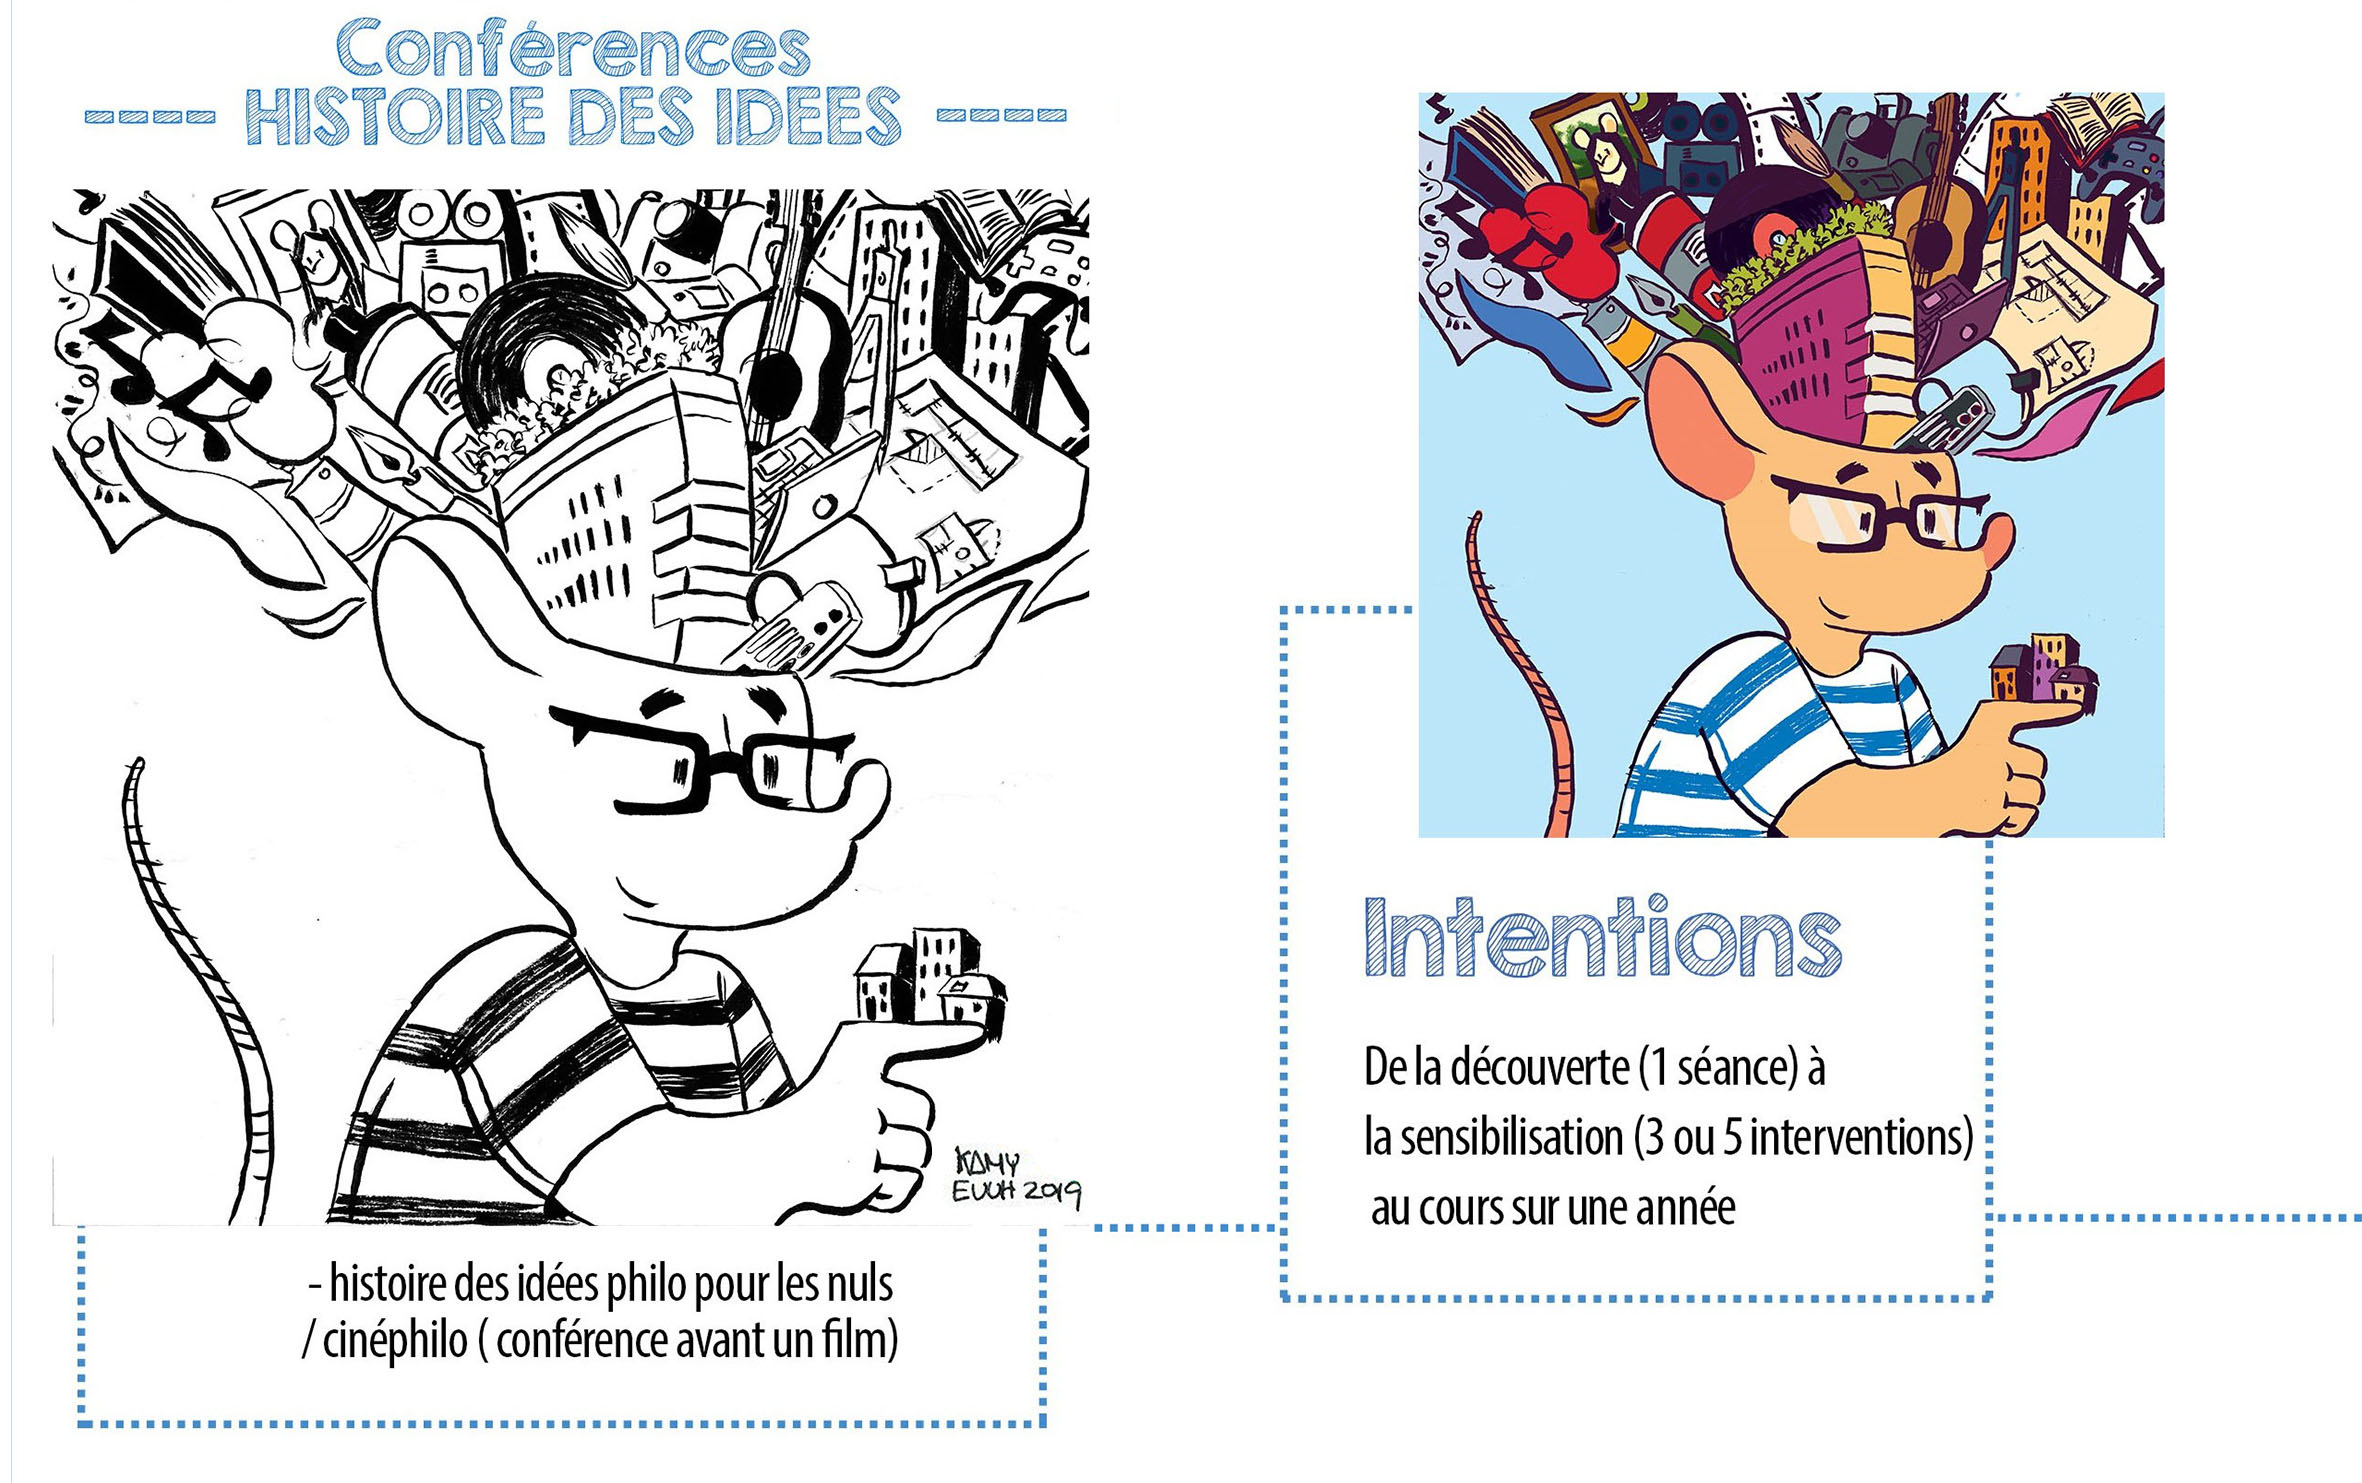 bandeau-activites-conference-philo-hdi-PREFIGURATIONS-V2